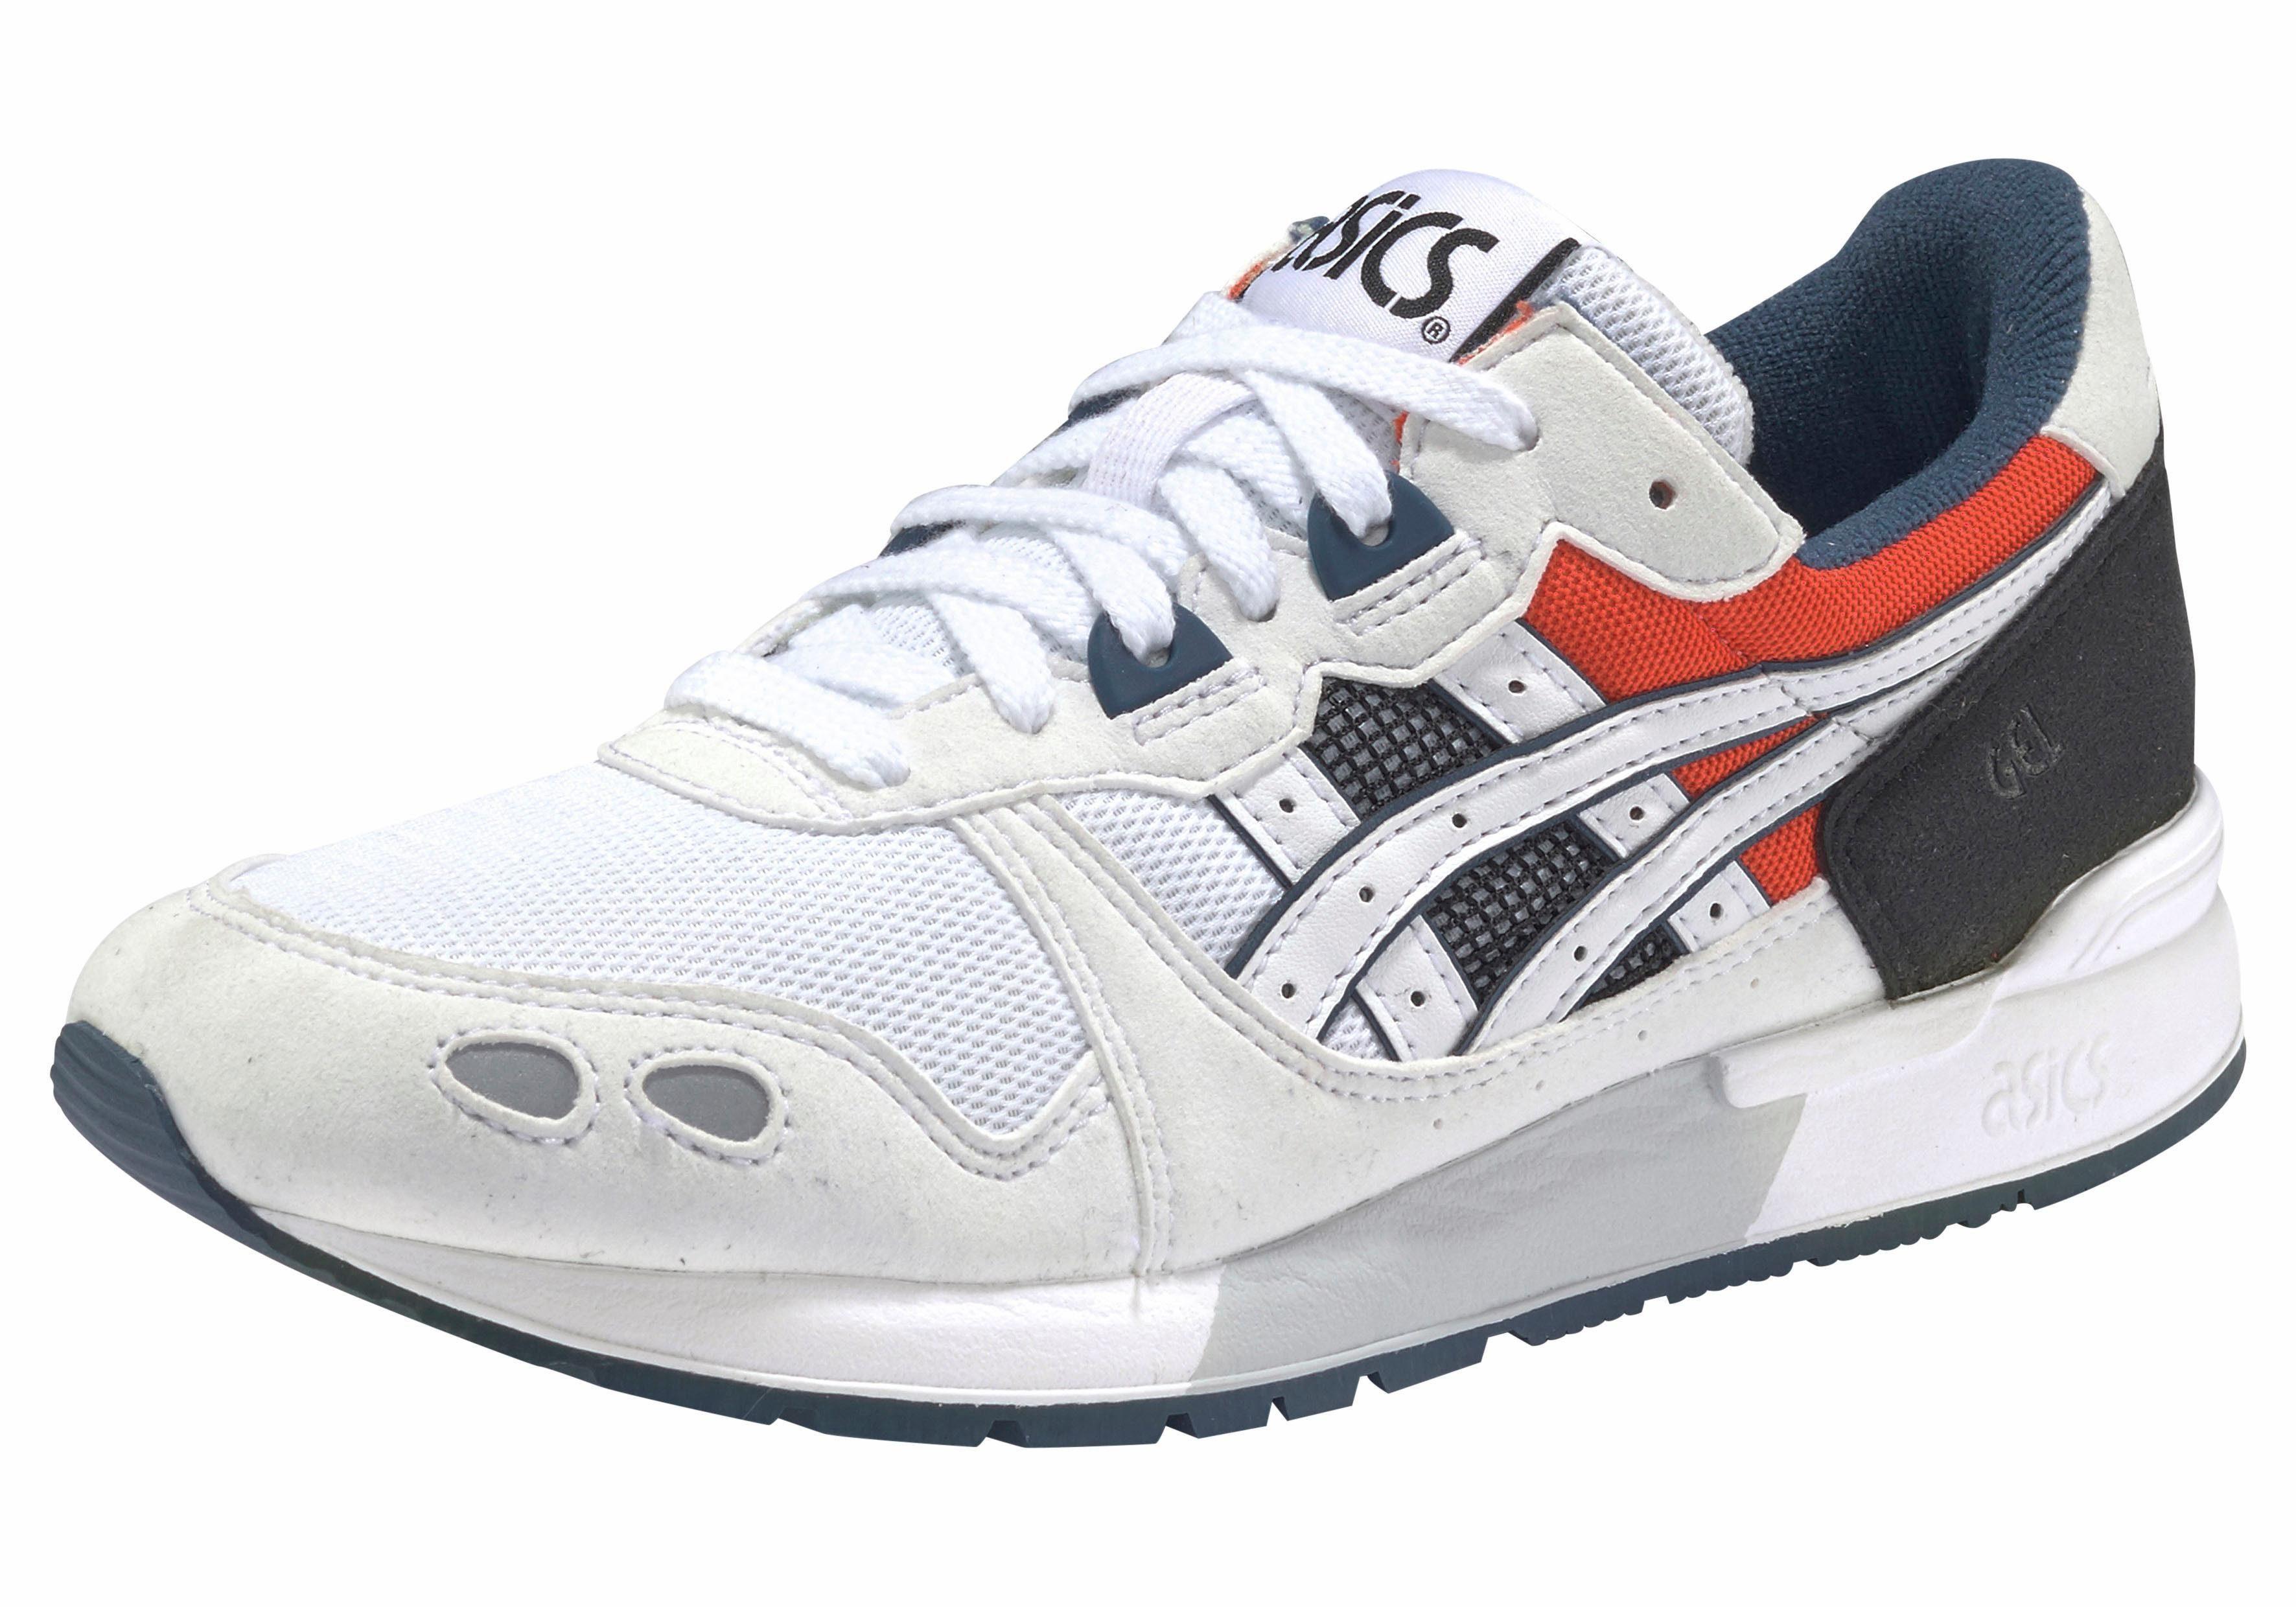 ASICS tiger GEL-LYTE Sneaker, unisex kaufen  weiß-petrol-orange